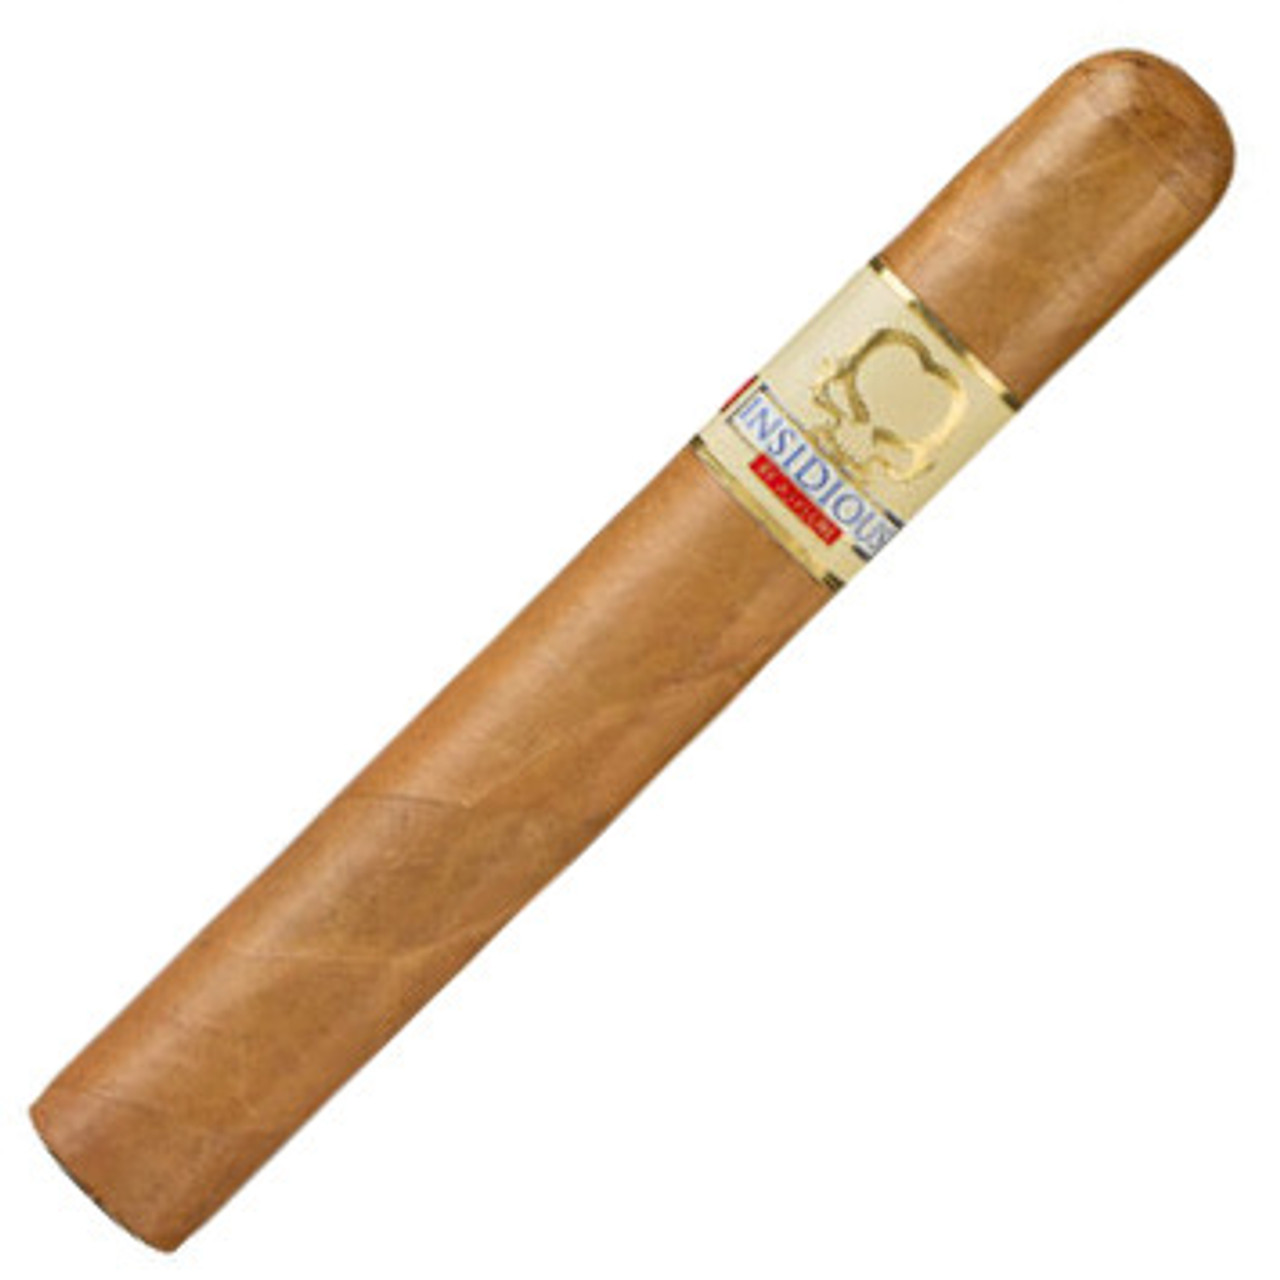 Asylum Insidious 52 X 6 Cigars - 6 x 52 (Box of 25)